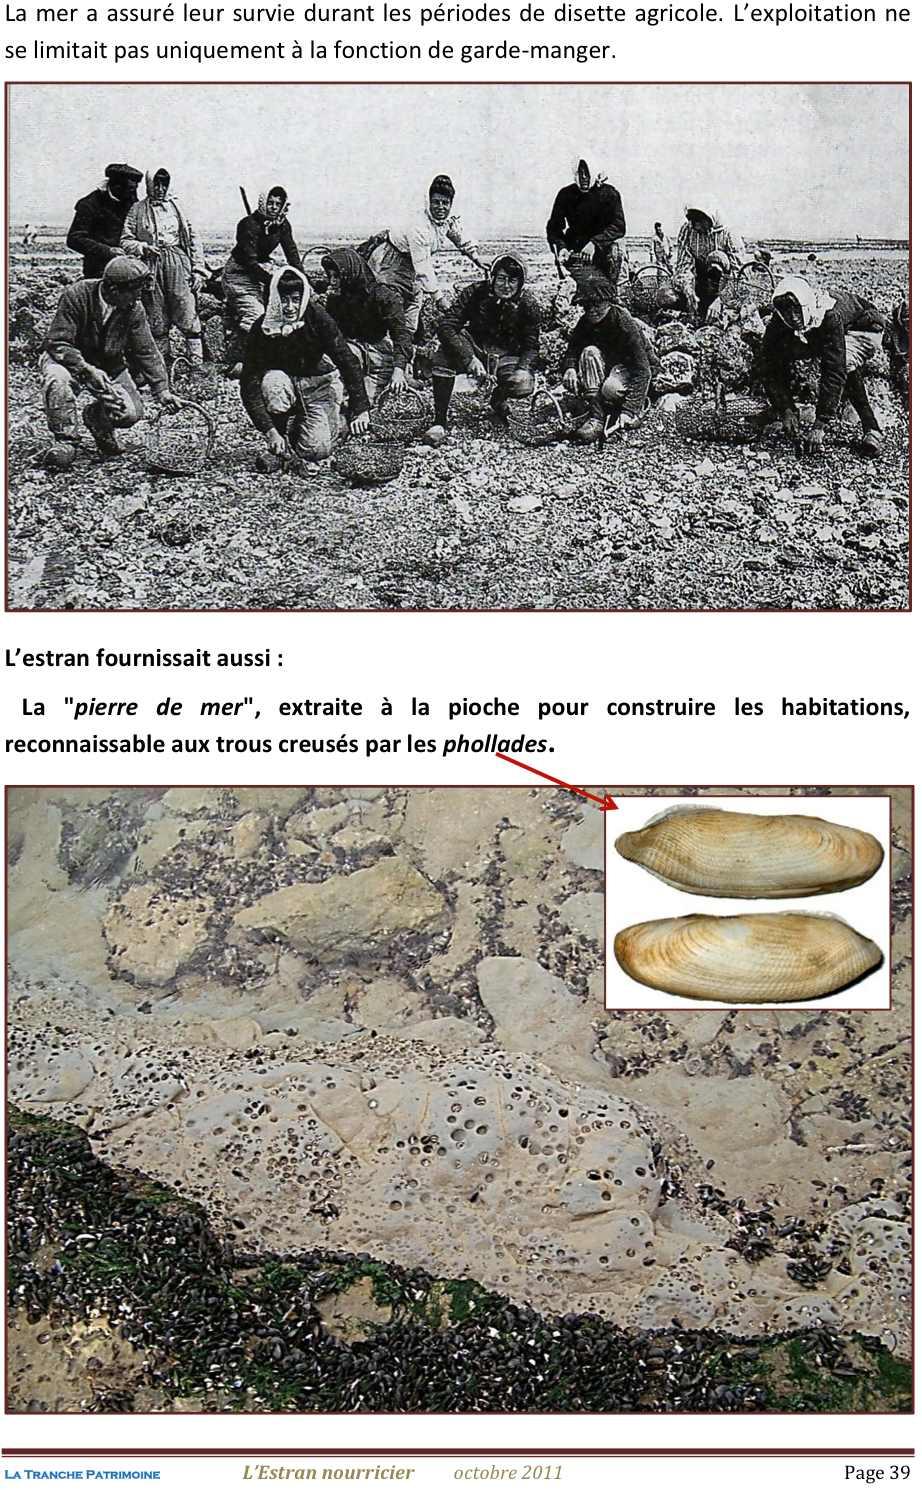 Lestran Nourricier 39 jpeg1.jpg